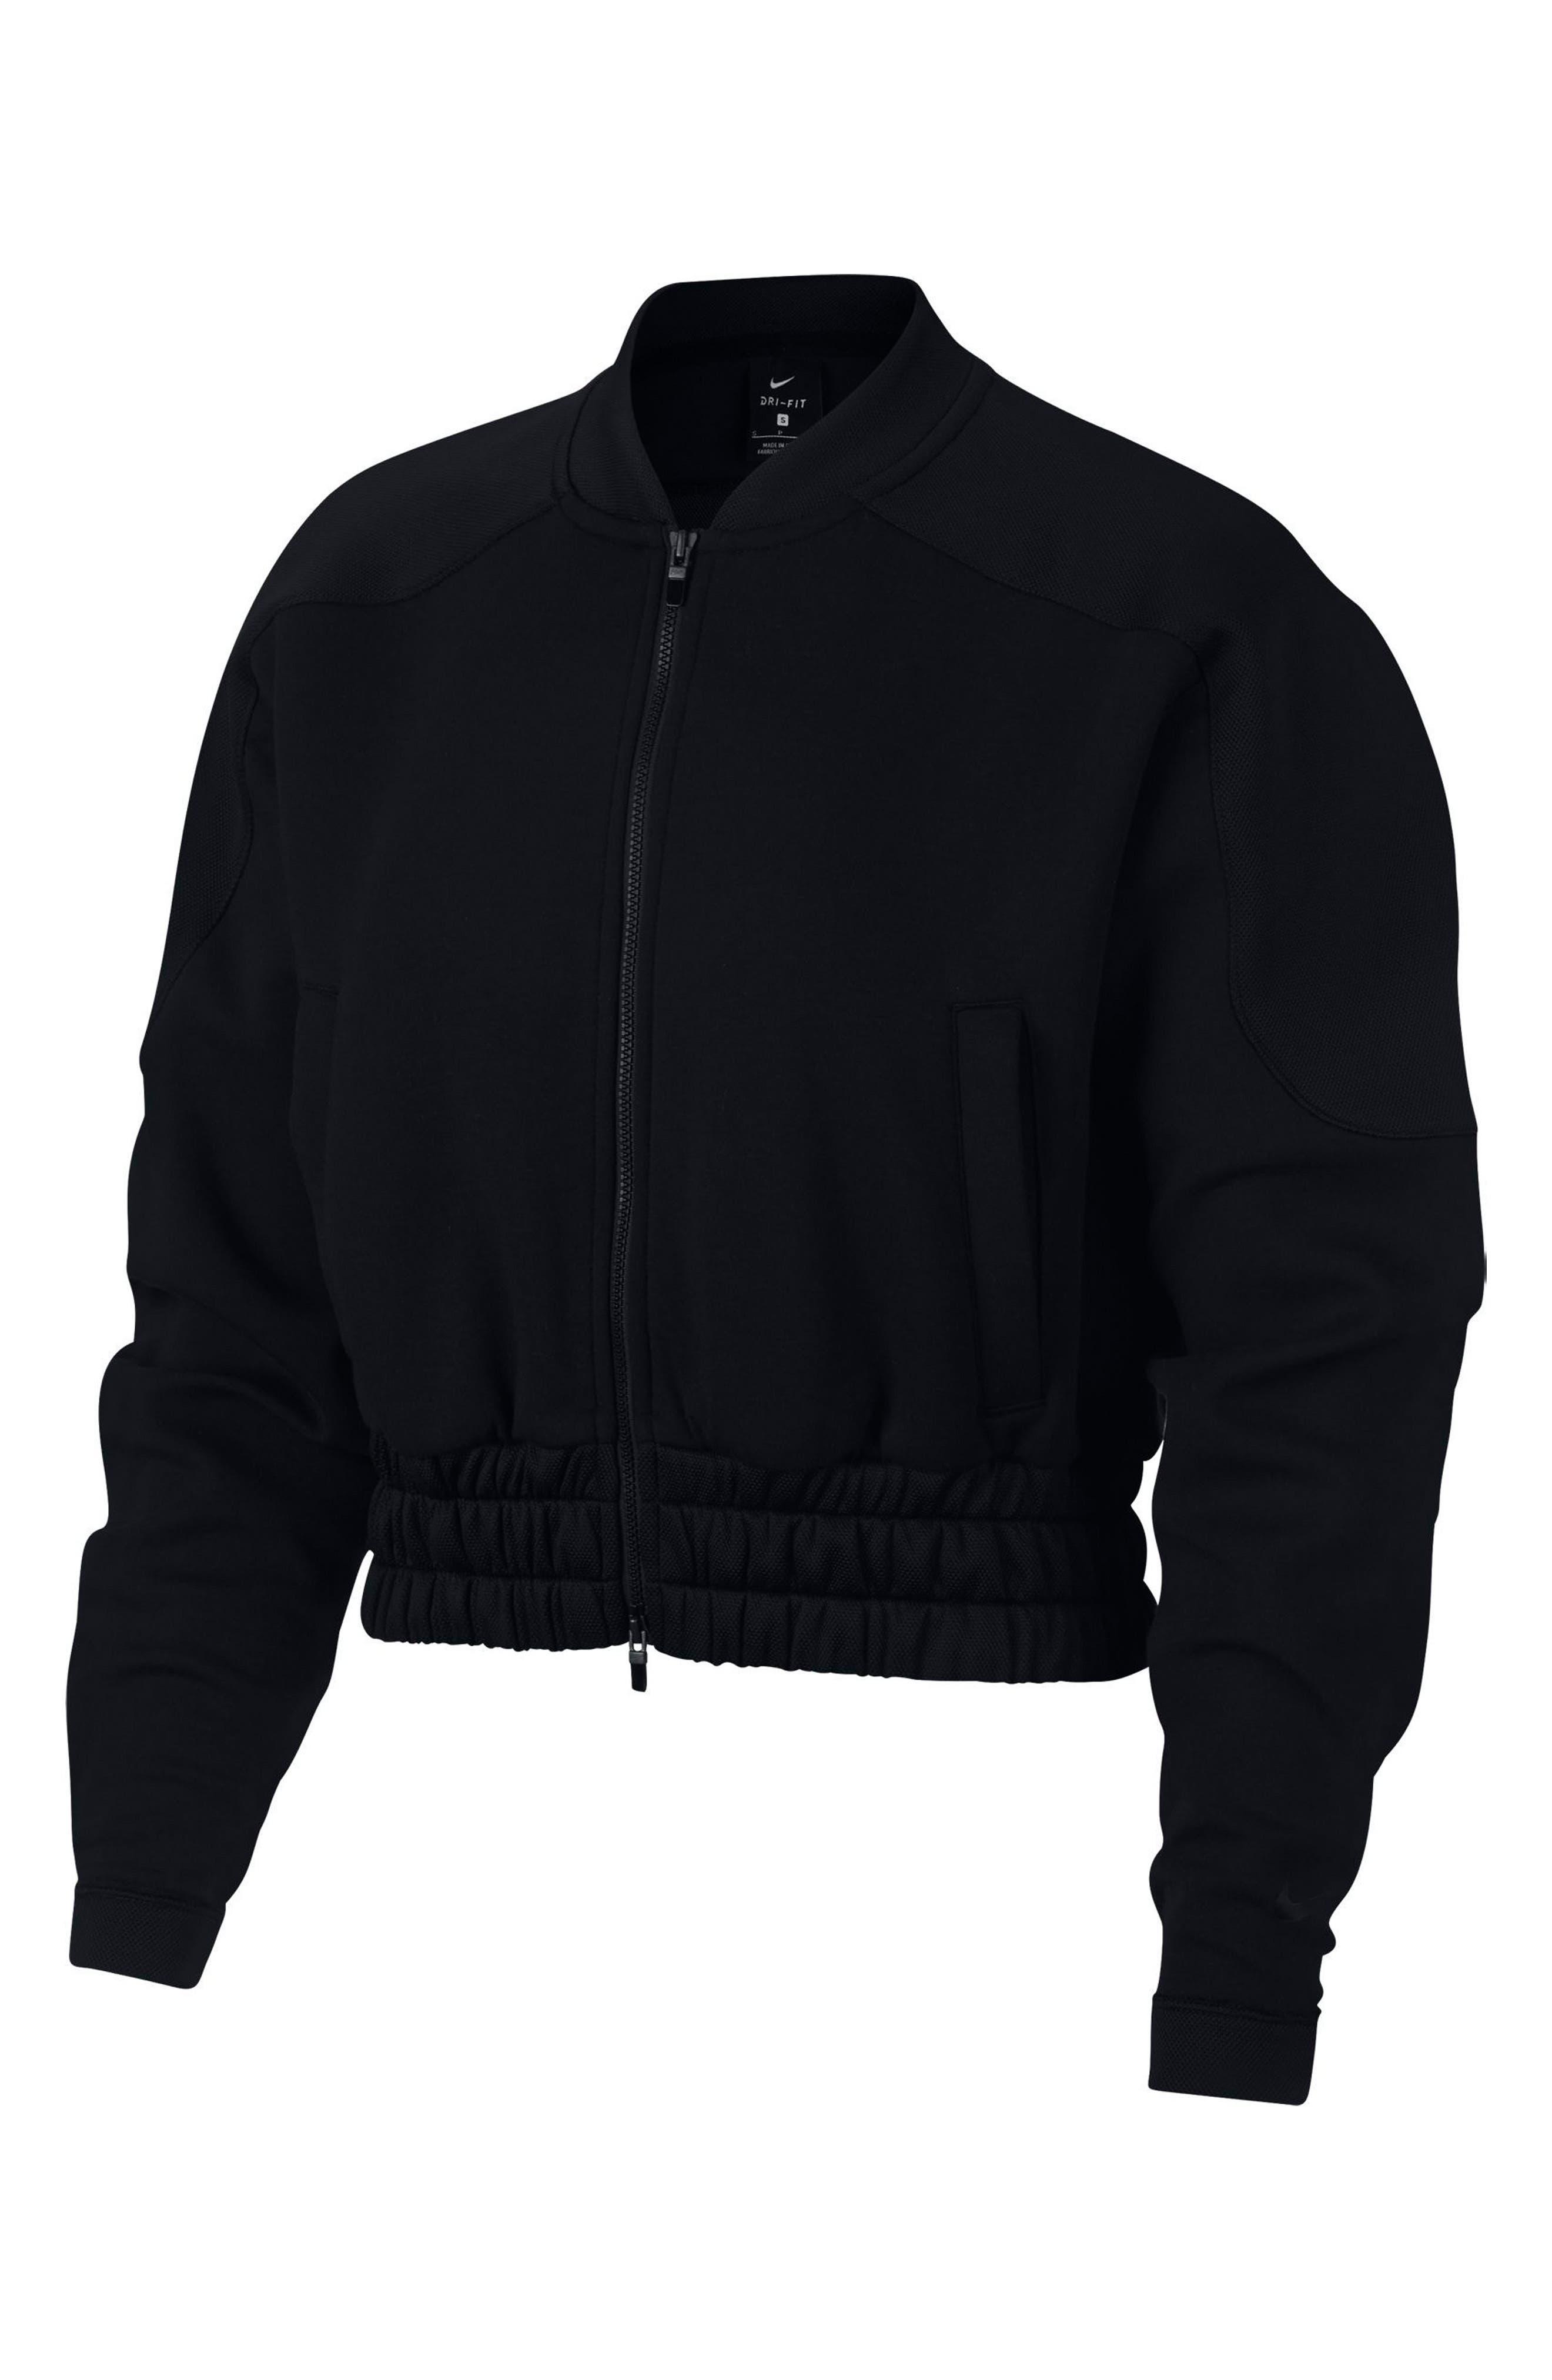 Dry Women's Bomber Jacket,                         Main,                         color, BLACK/ BLACK